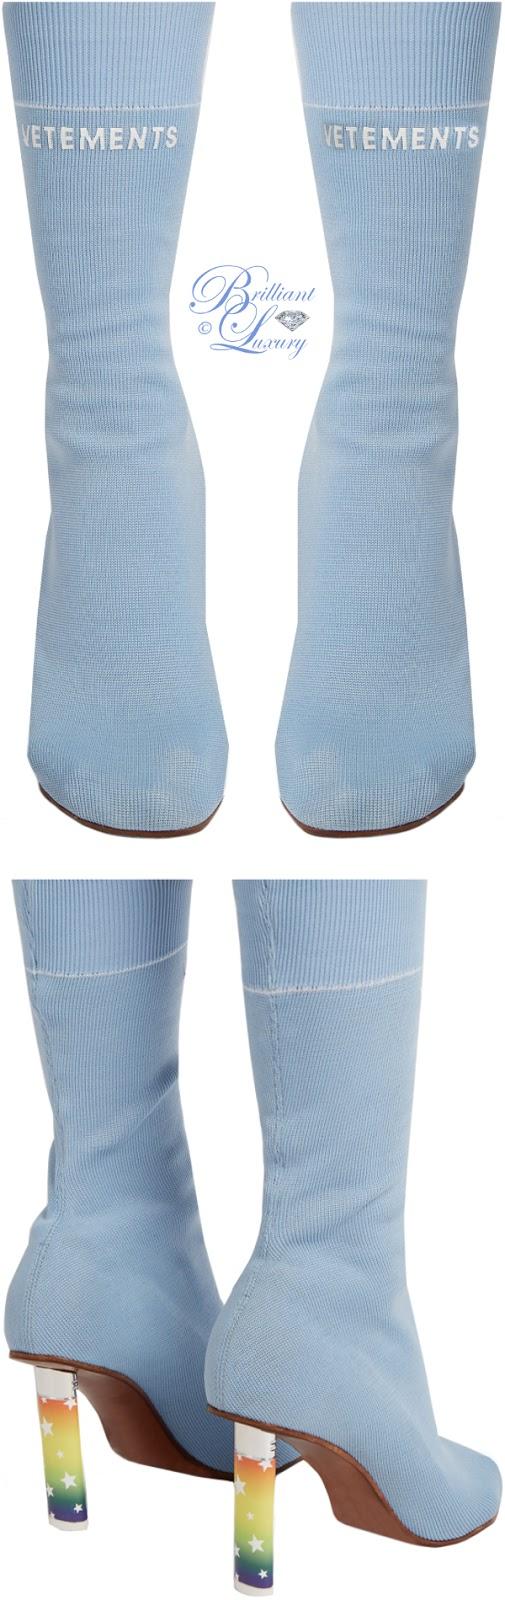 Brilliant Luxury ♦ Vetements lighter heel ankle boots